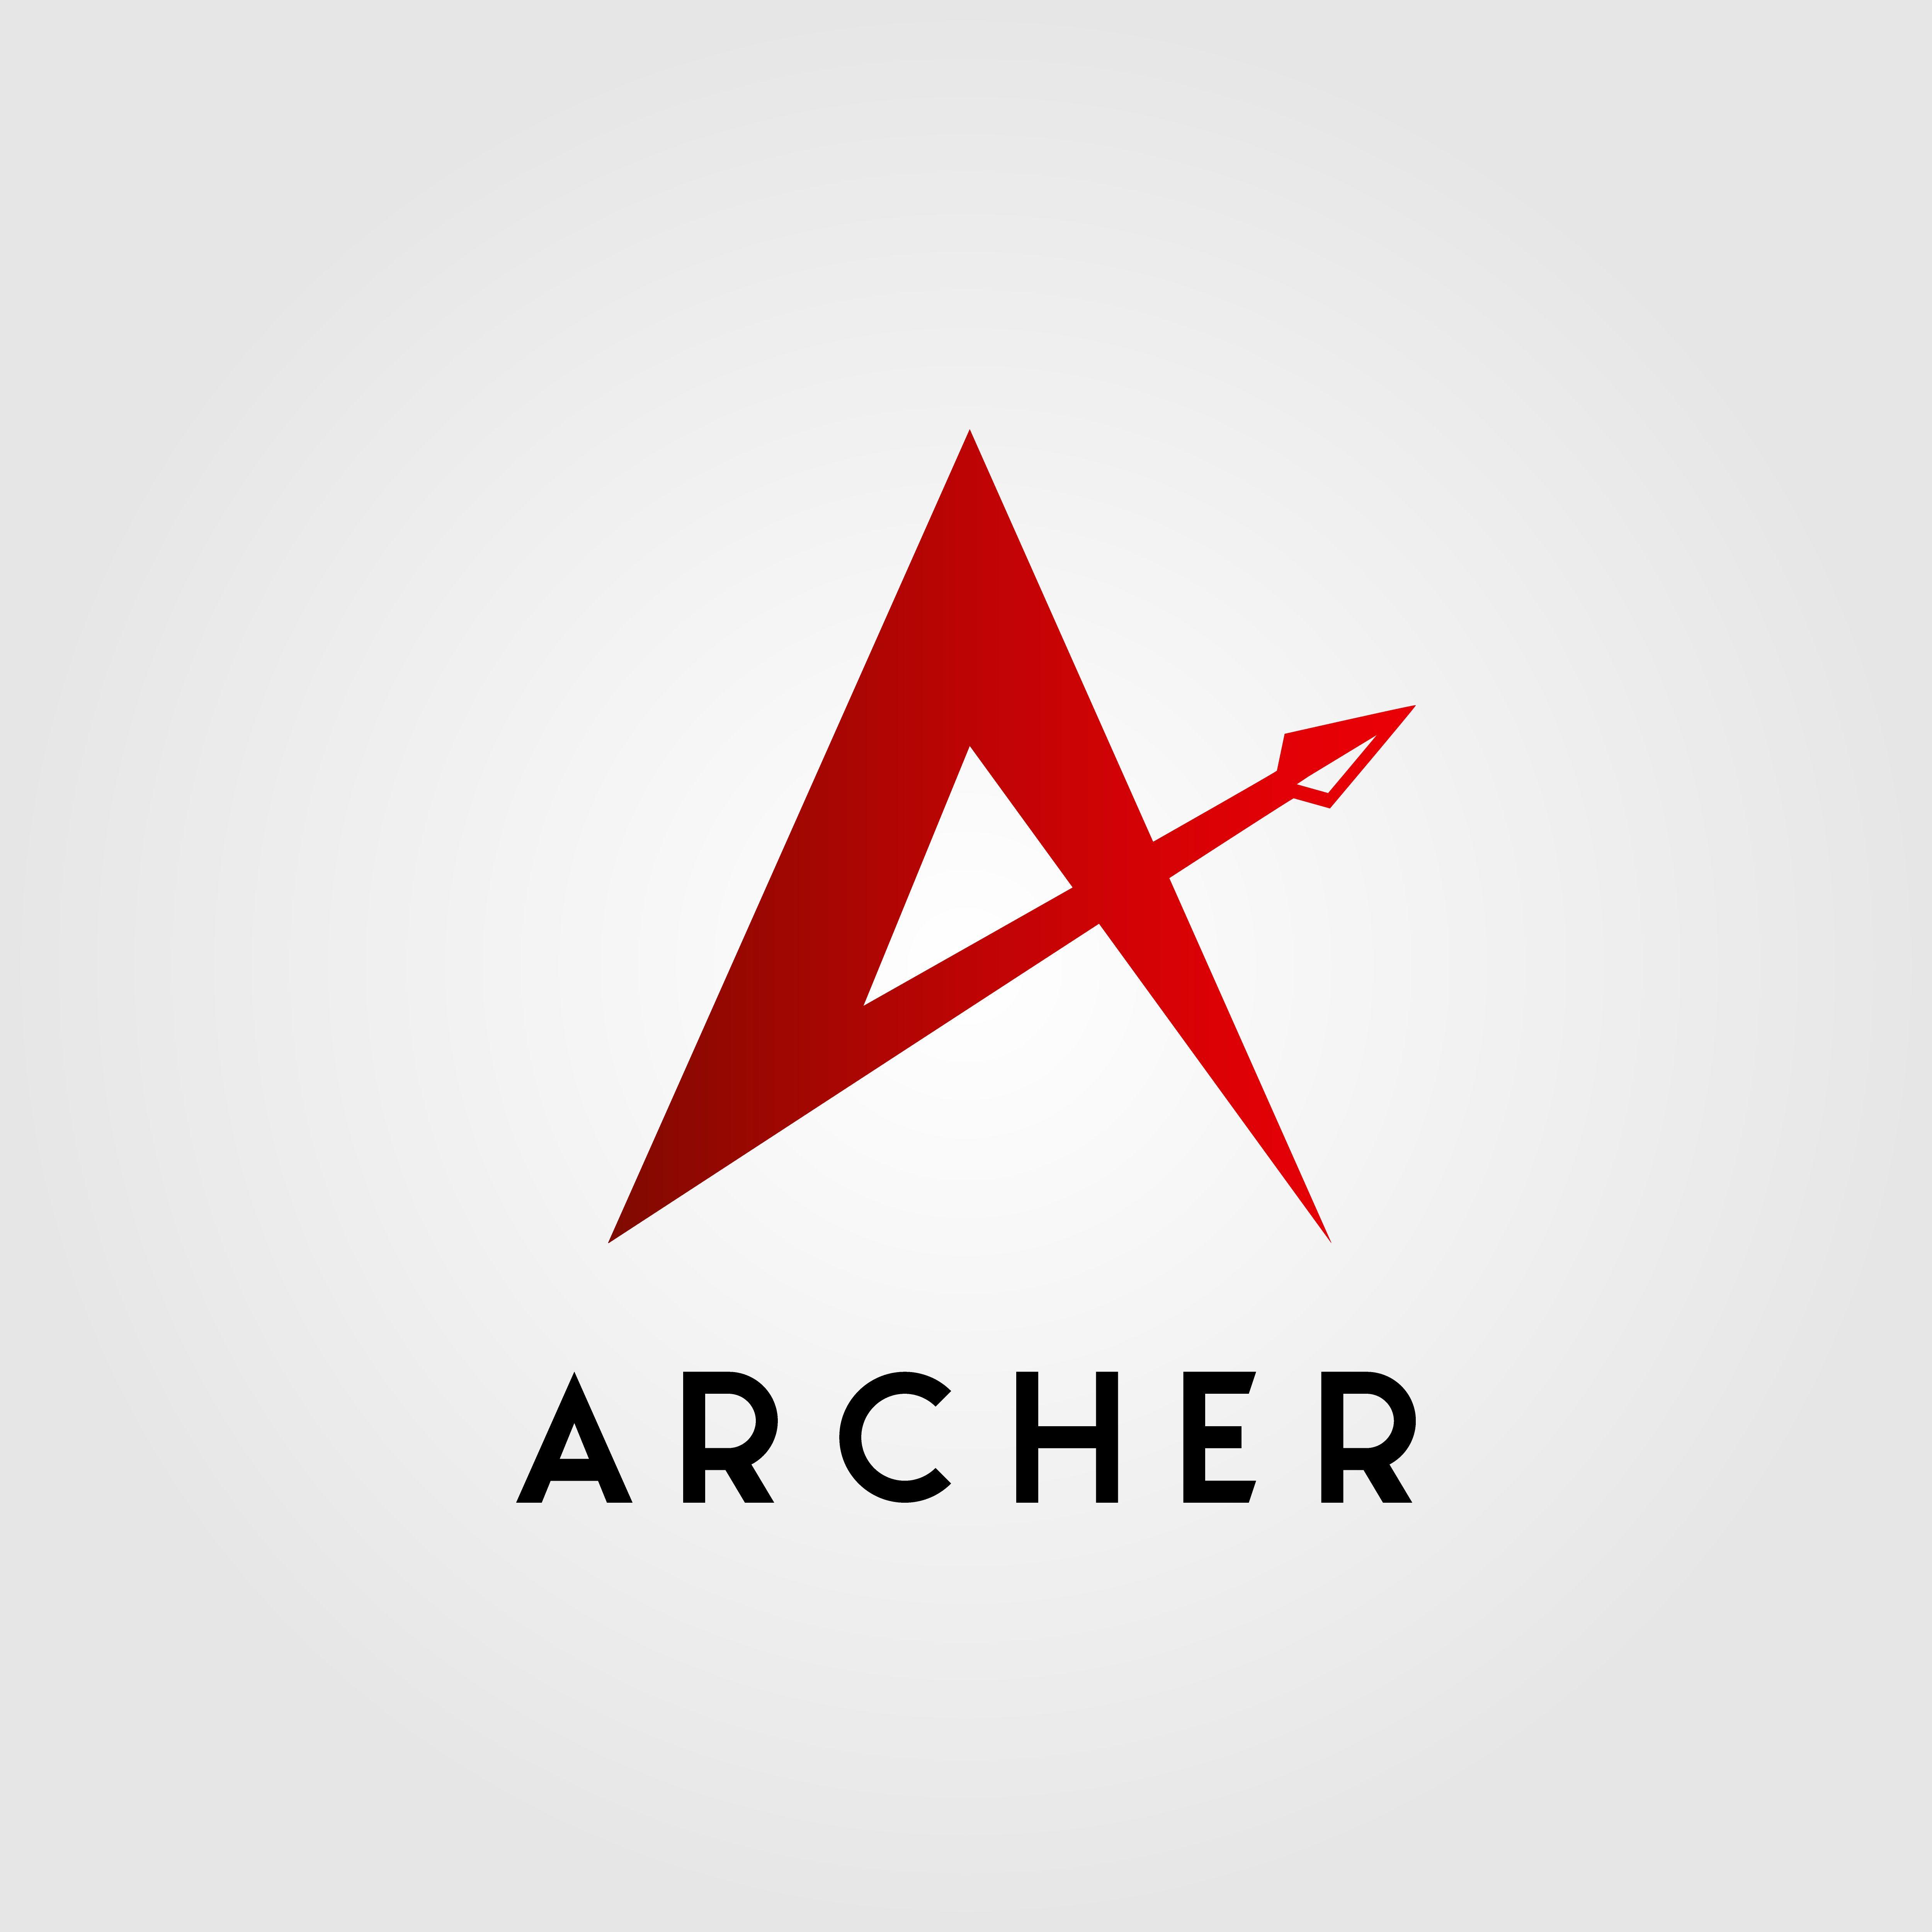 Letter A Letter A Archer Arrow Head Logo Design Vector Illustration Hard Work Up Office Abstract Background Beat Curve Disp Desain Logo Desain